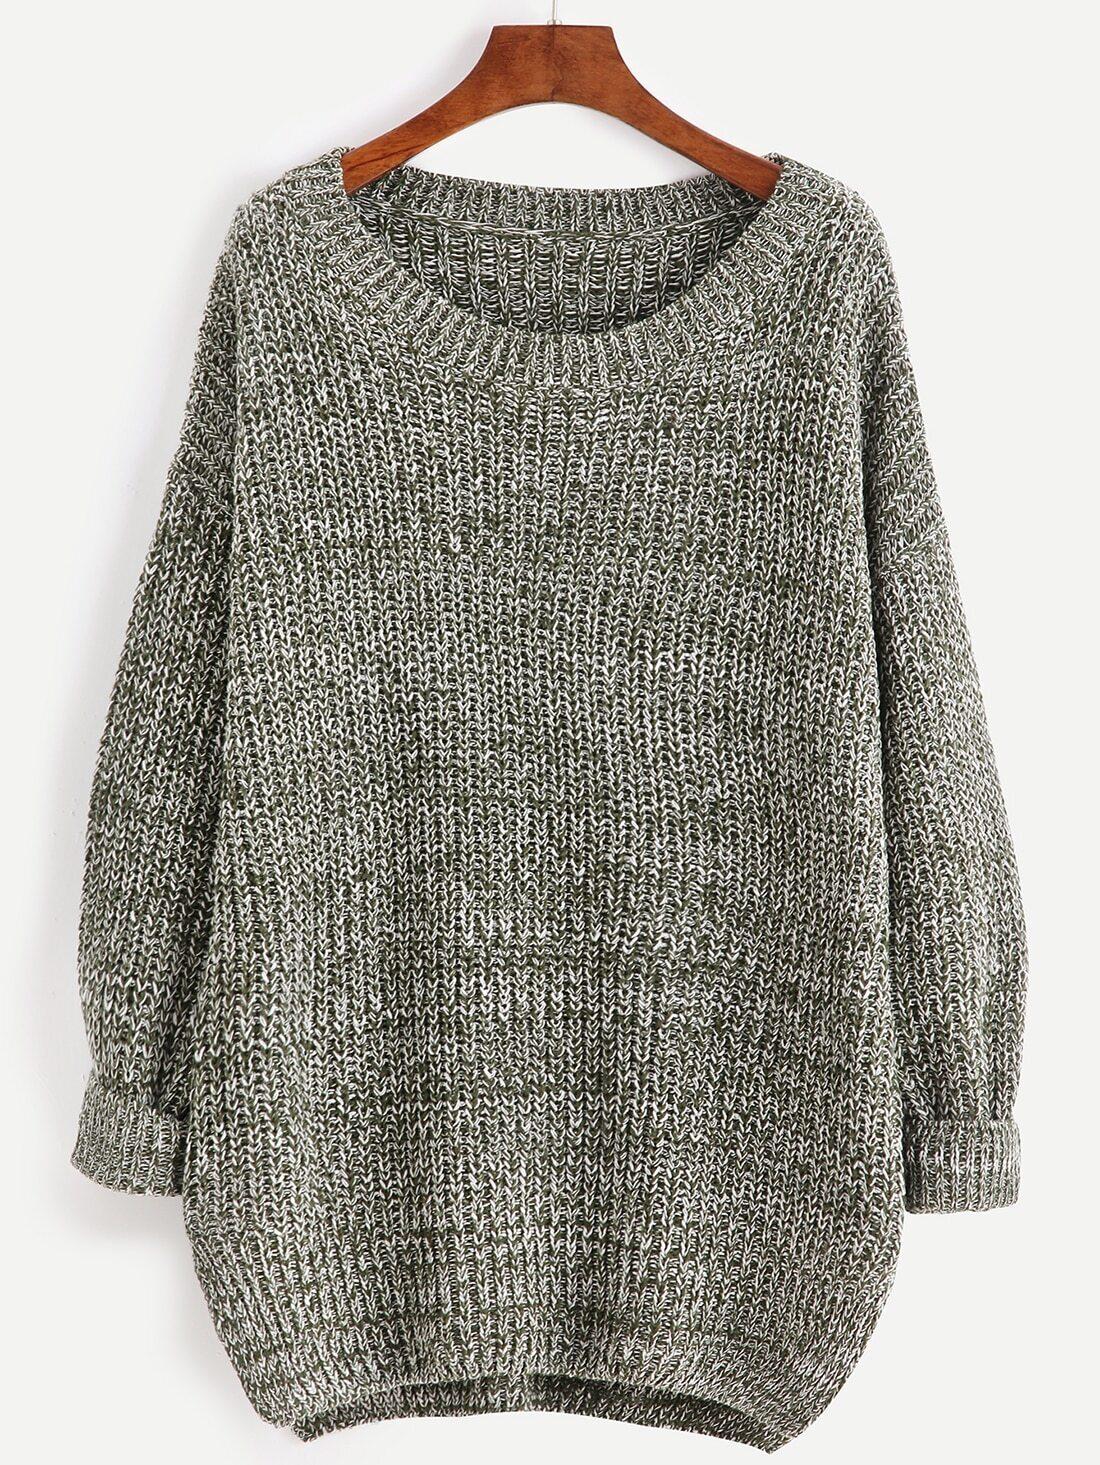 SheIn Grey Marled Knit Slit Cocoon Sweater